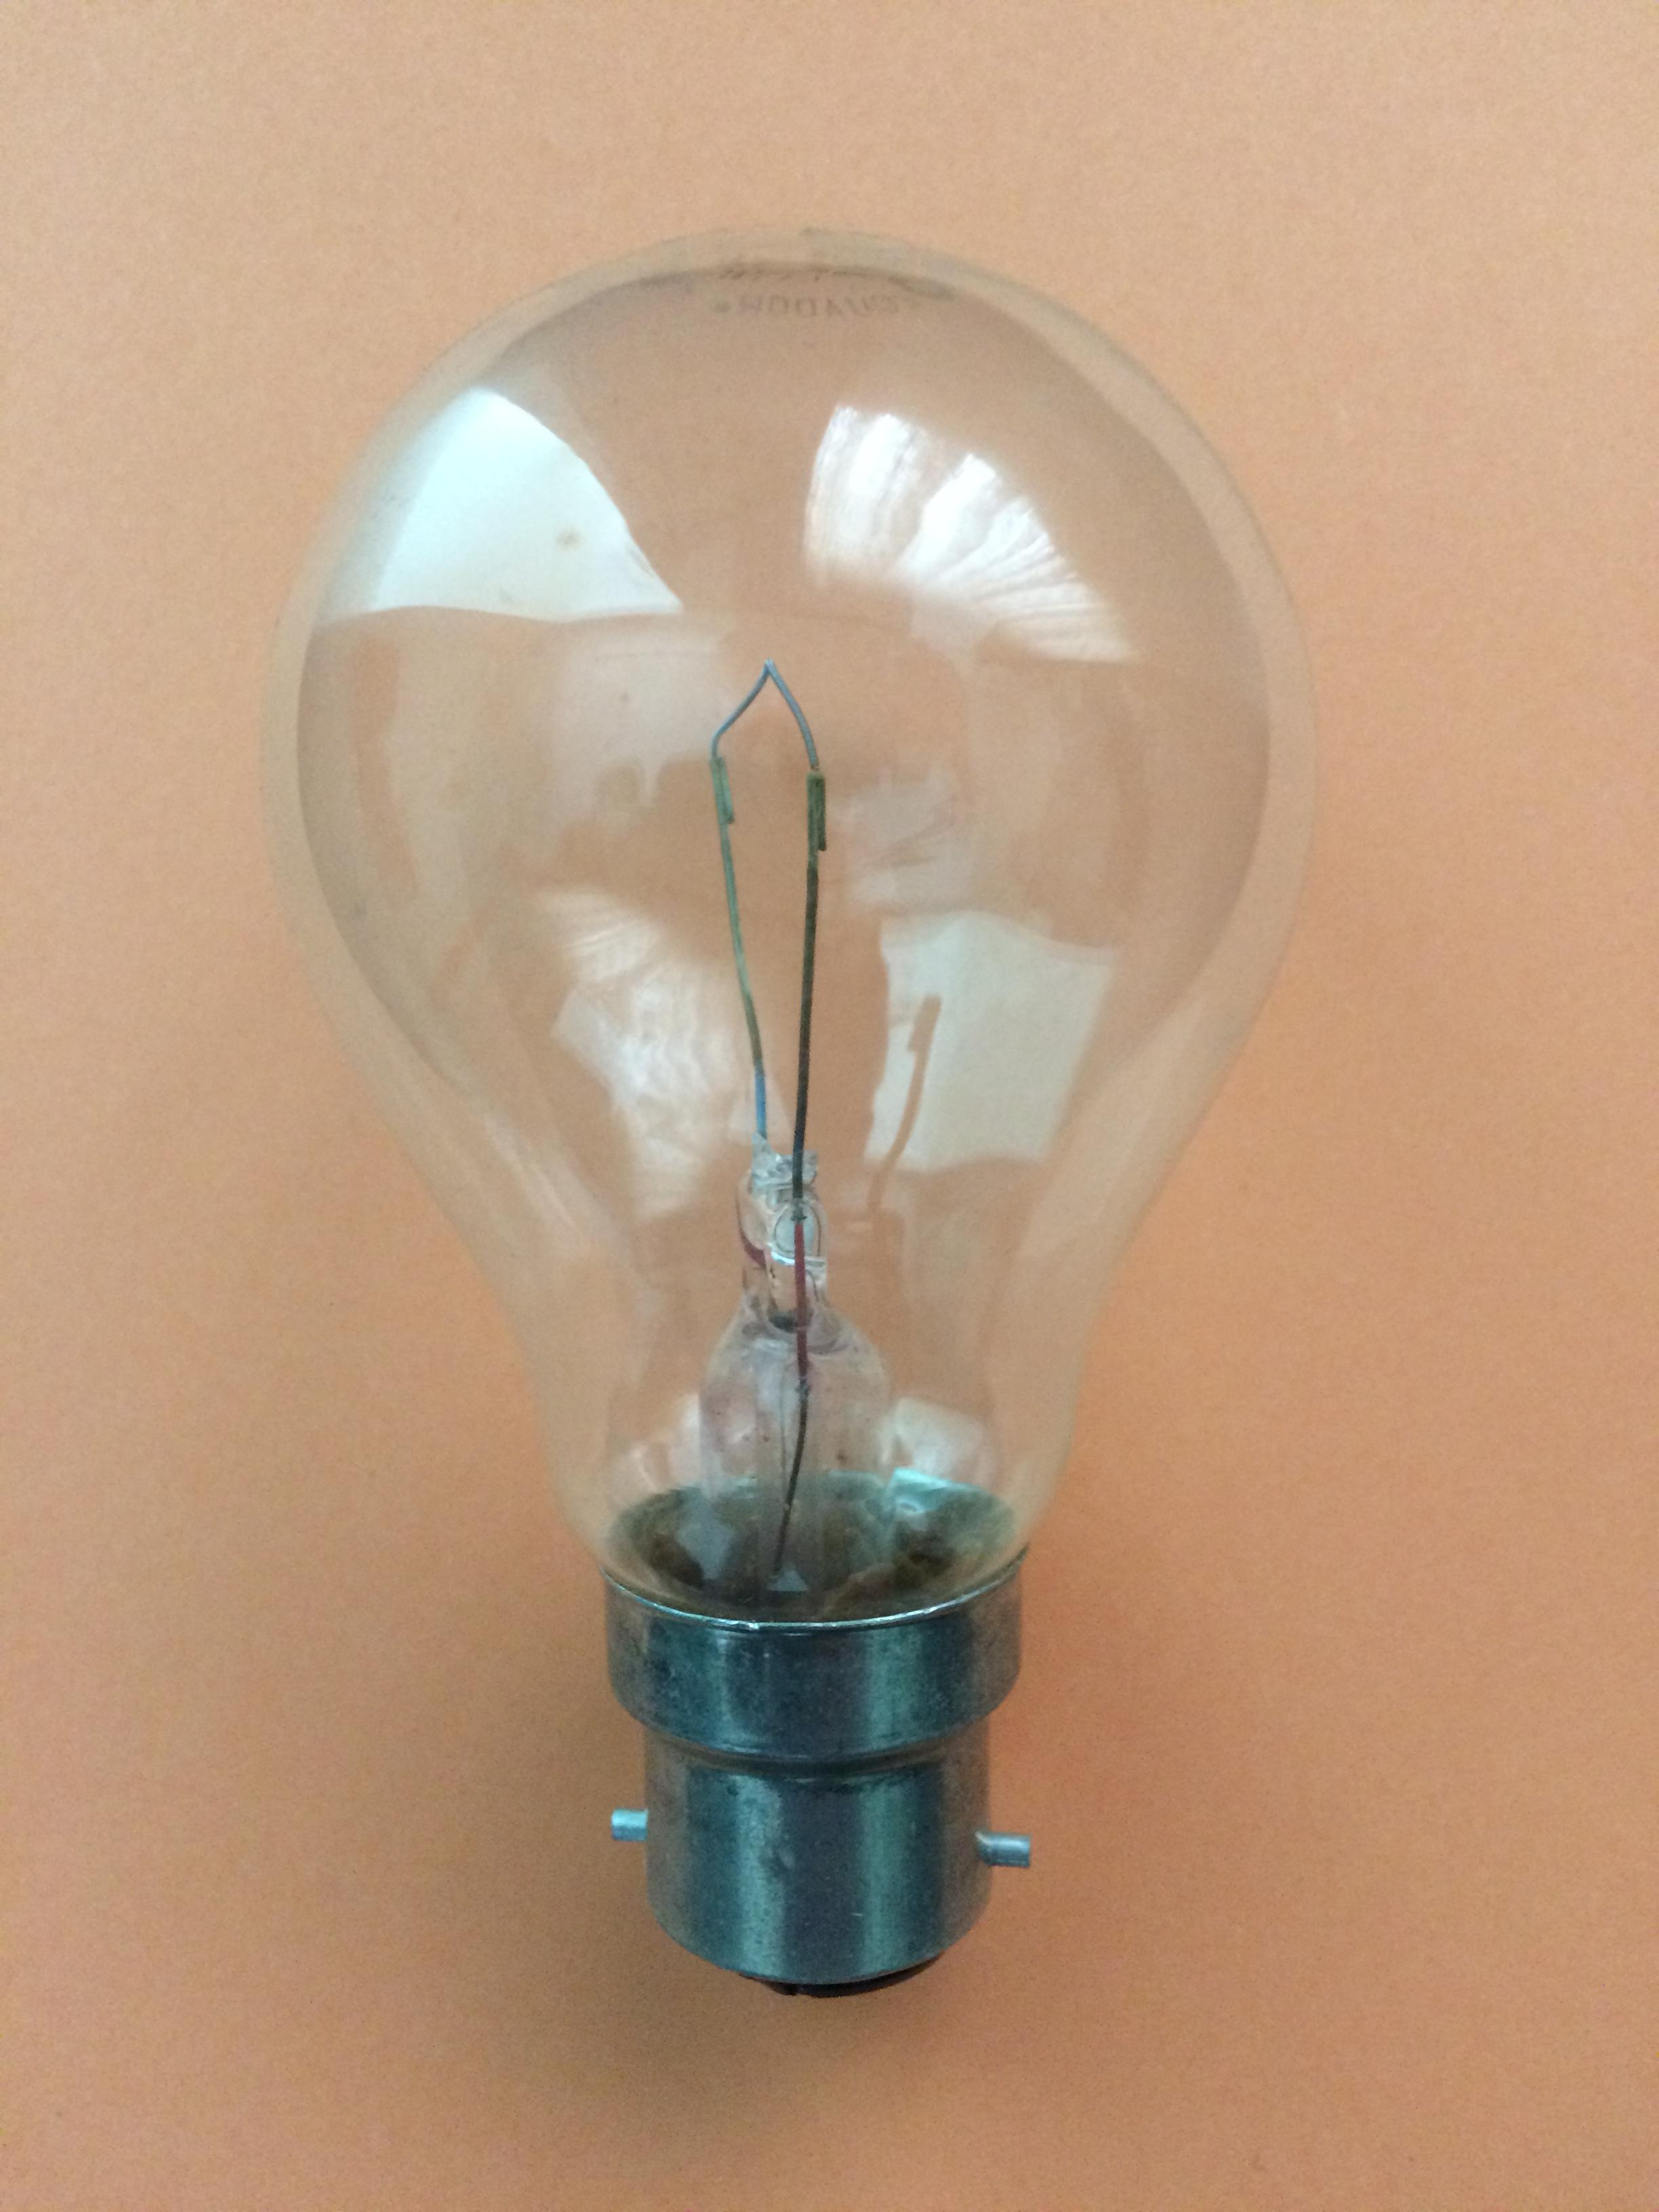 32V60WBC: RESISTIVE LOAD (Incandescent Lamp Bulb) Image